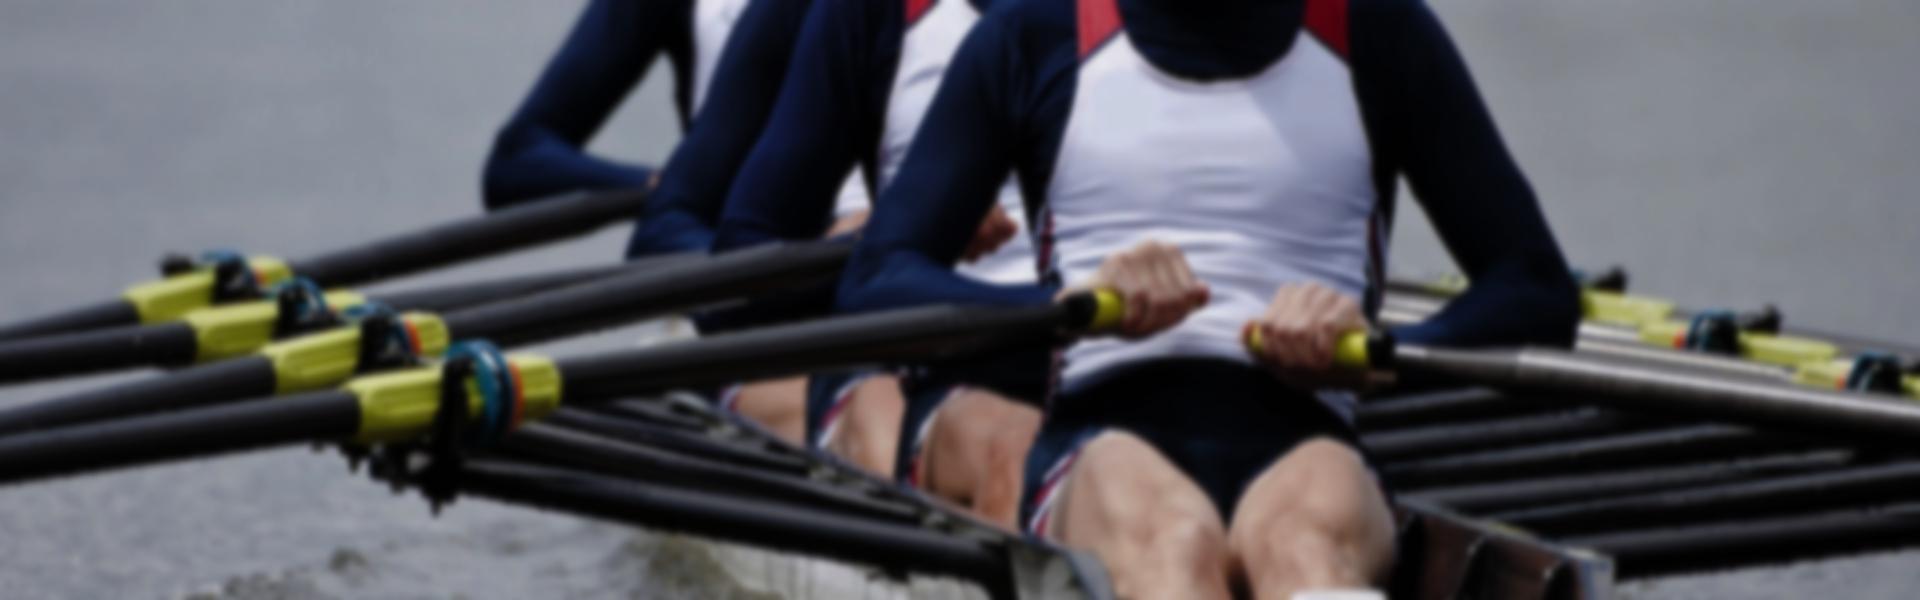 cropped-cropped-1-website-like-a-team-rowing-teamwork.jpg